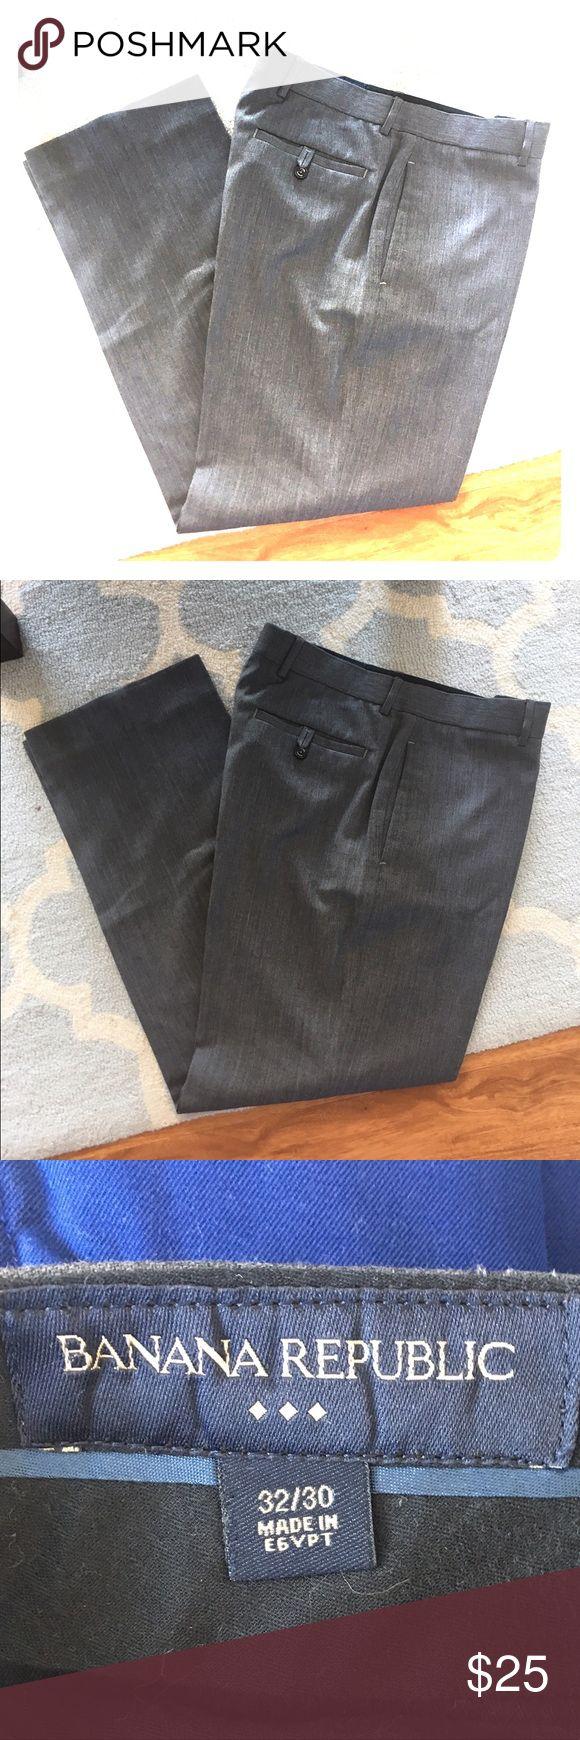 Banana republic 32x30 dark grey dress pants Banana Republic Factory Outlet dark gray dress pants. Standard Fit. Excellent used condition. 32x30. Banana Republic Pants Dress